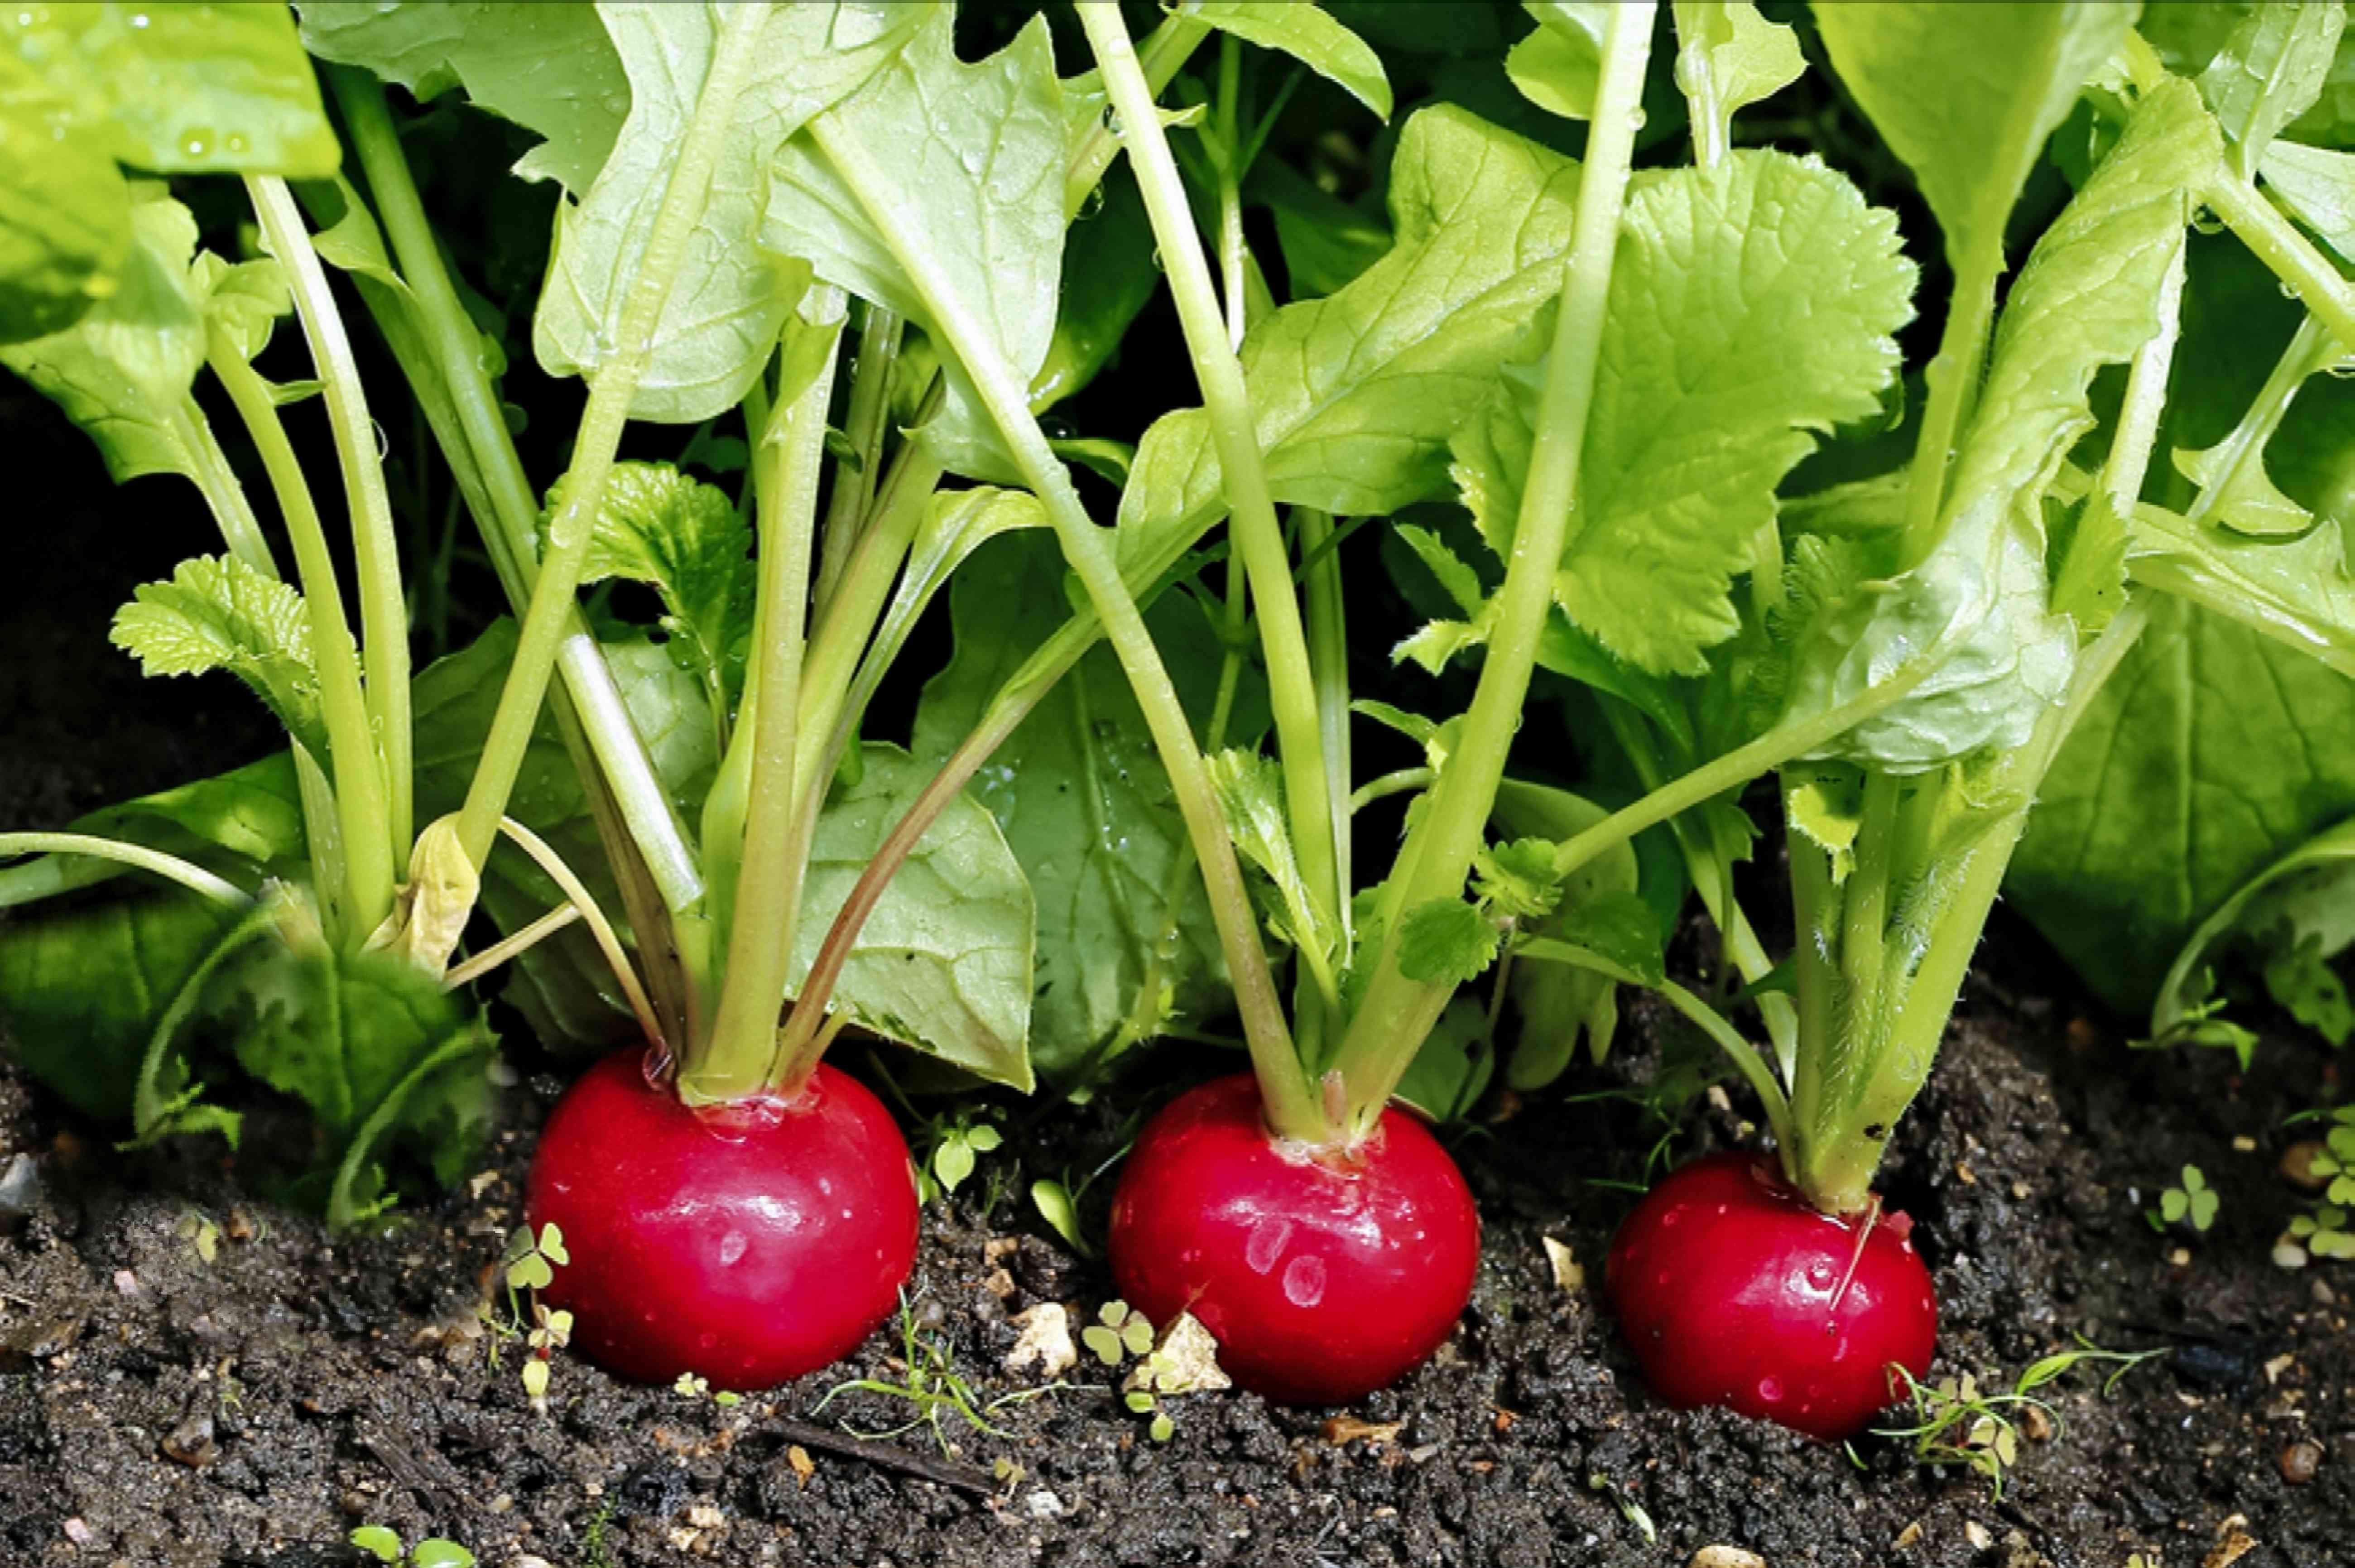 radishes ready for harvest